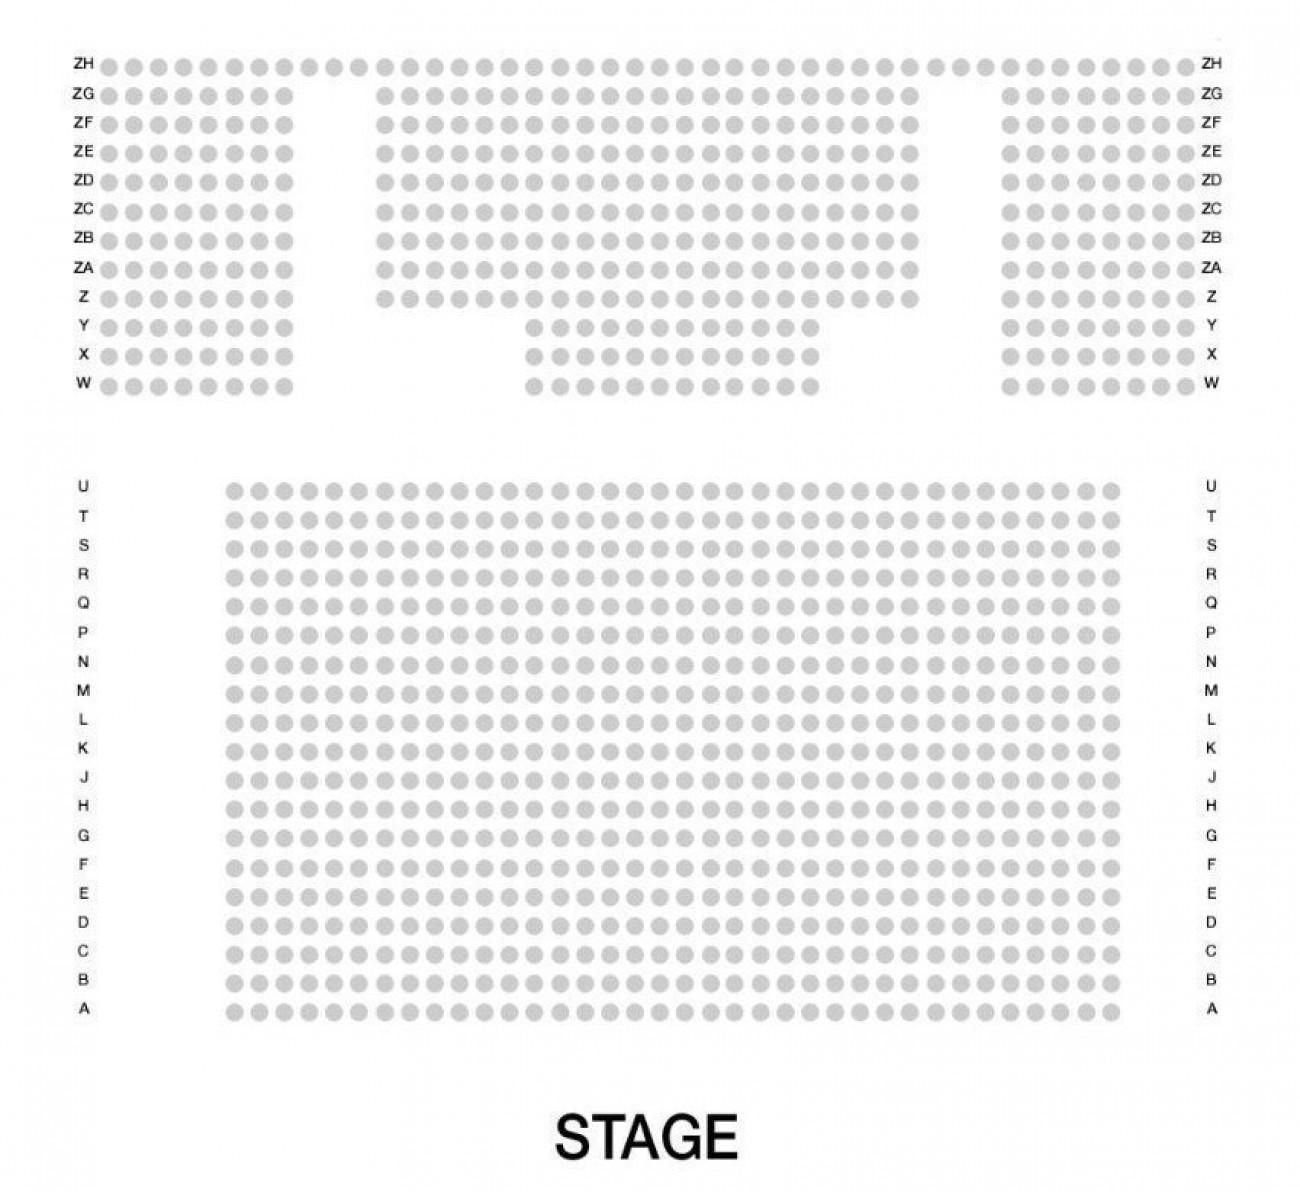 Troubadour White City Theatre